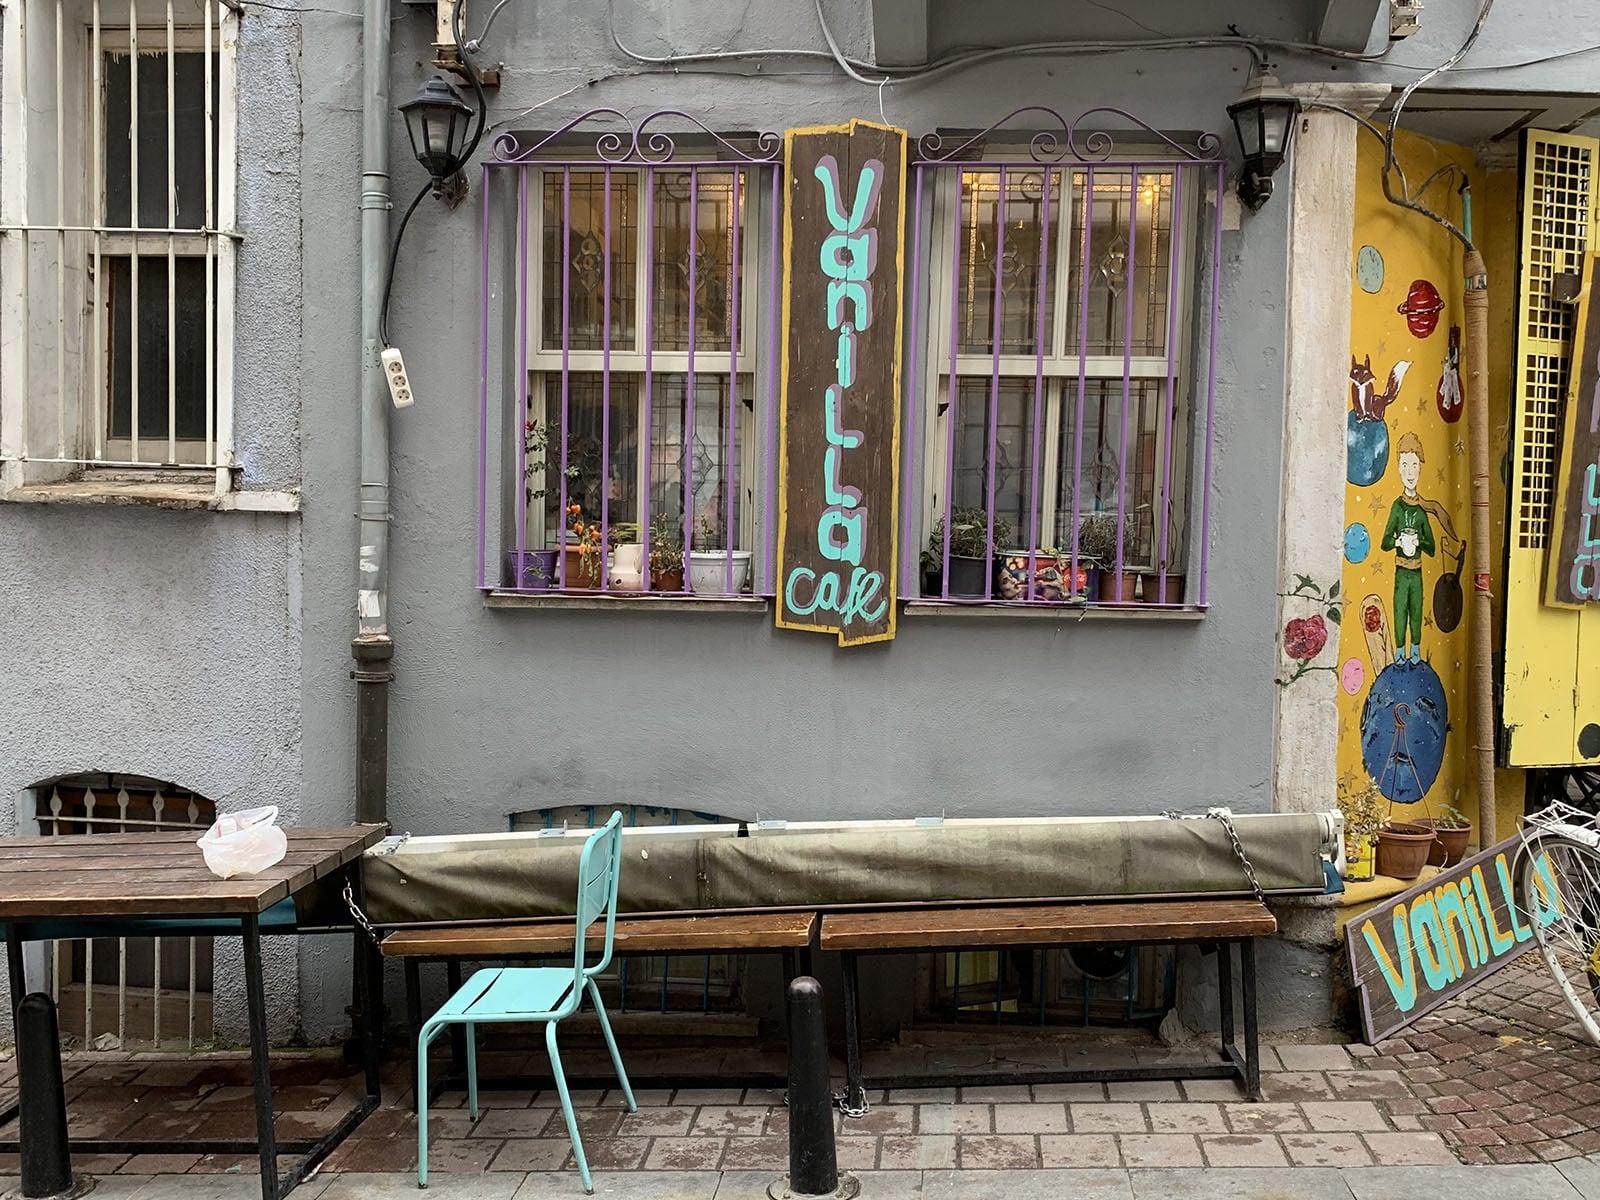 Coffee shops can be found in abundance in Balat.